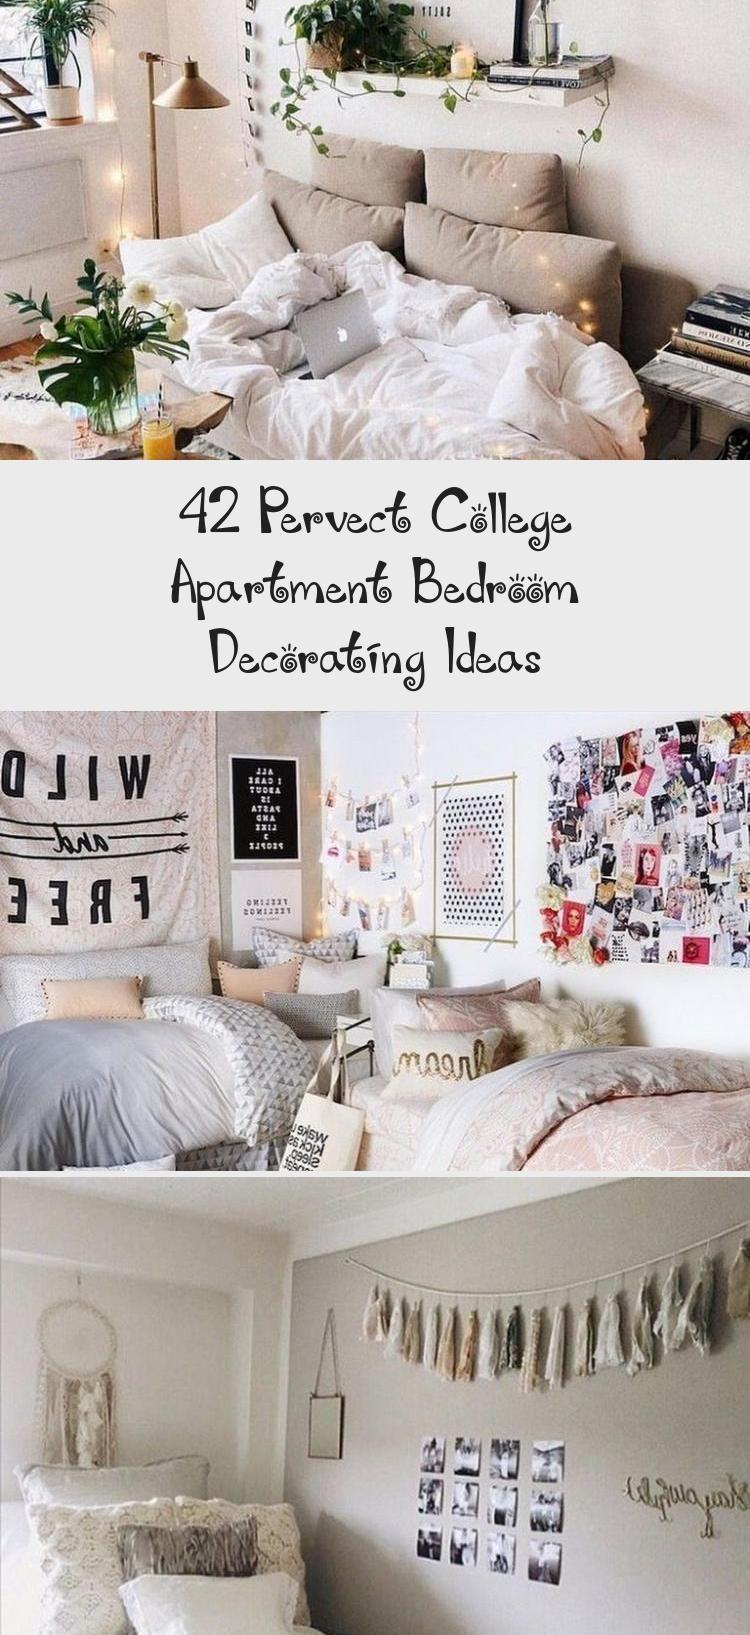 42 Pervect College Apartment Bedroom Decorating Ideas Apartment Bedroom In 2020 Apartment Decorating College Bedroom Apartment Bedroom Decor College Bedroom Apartment